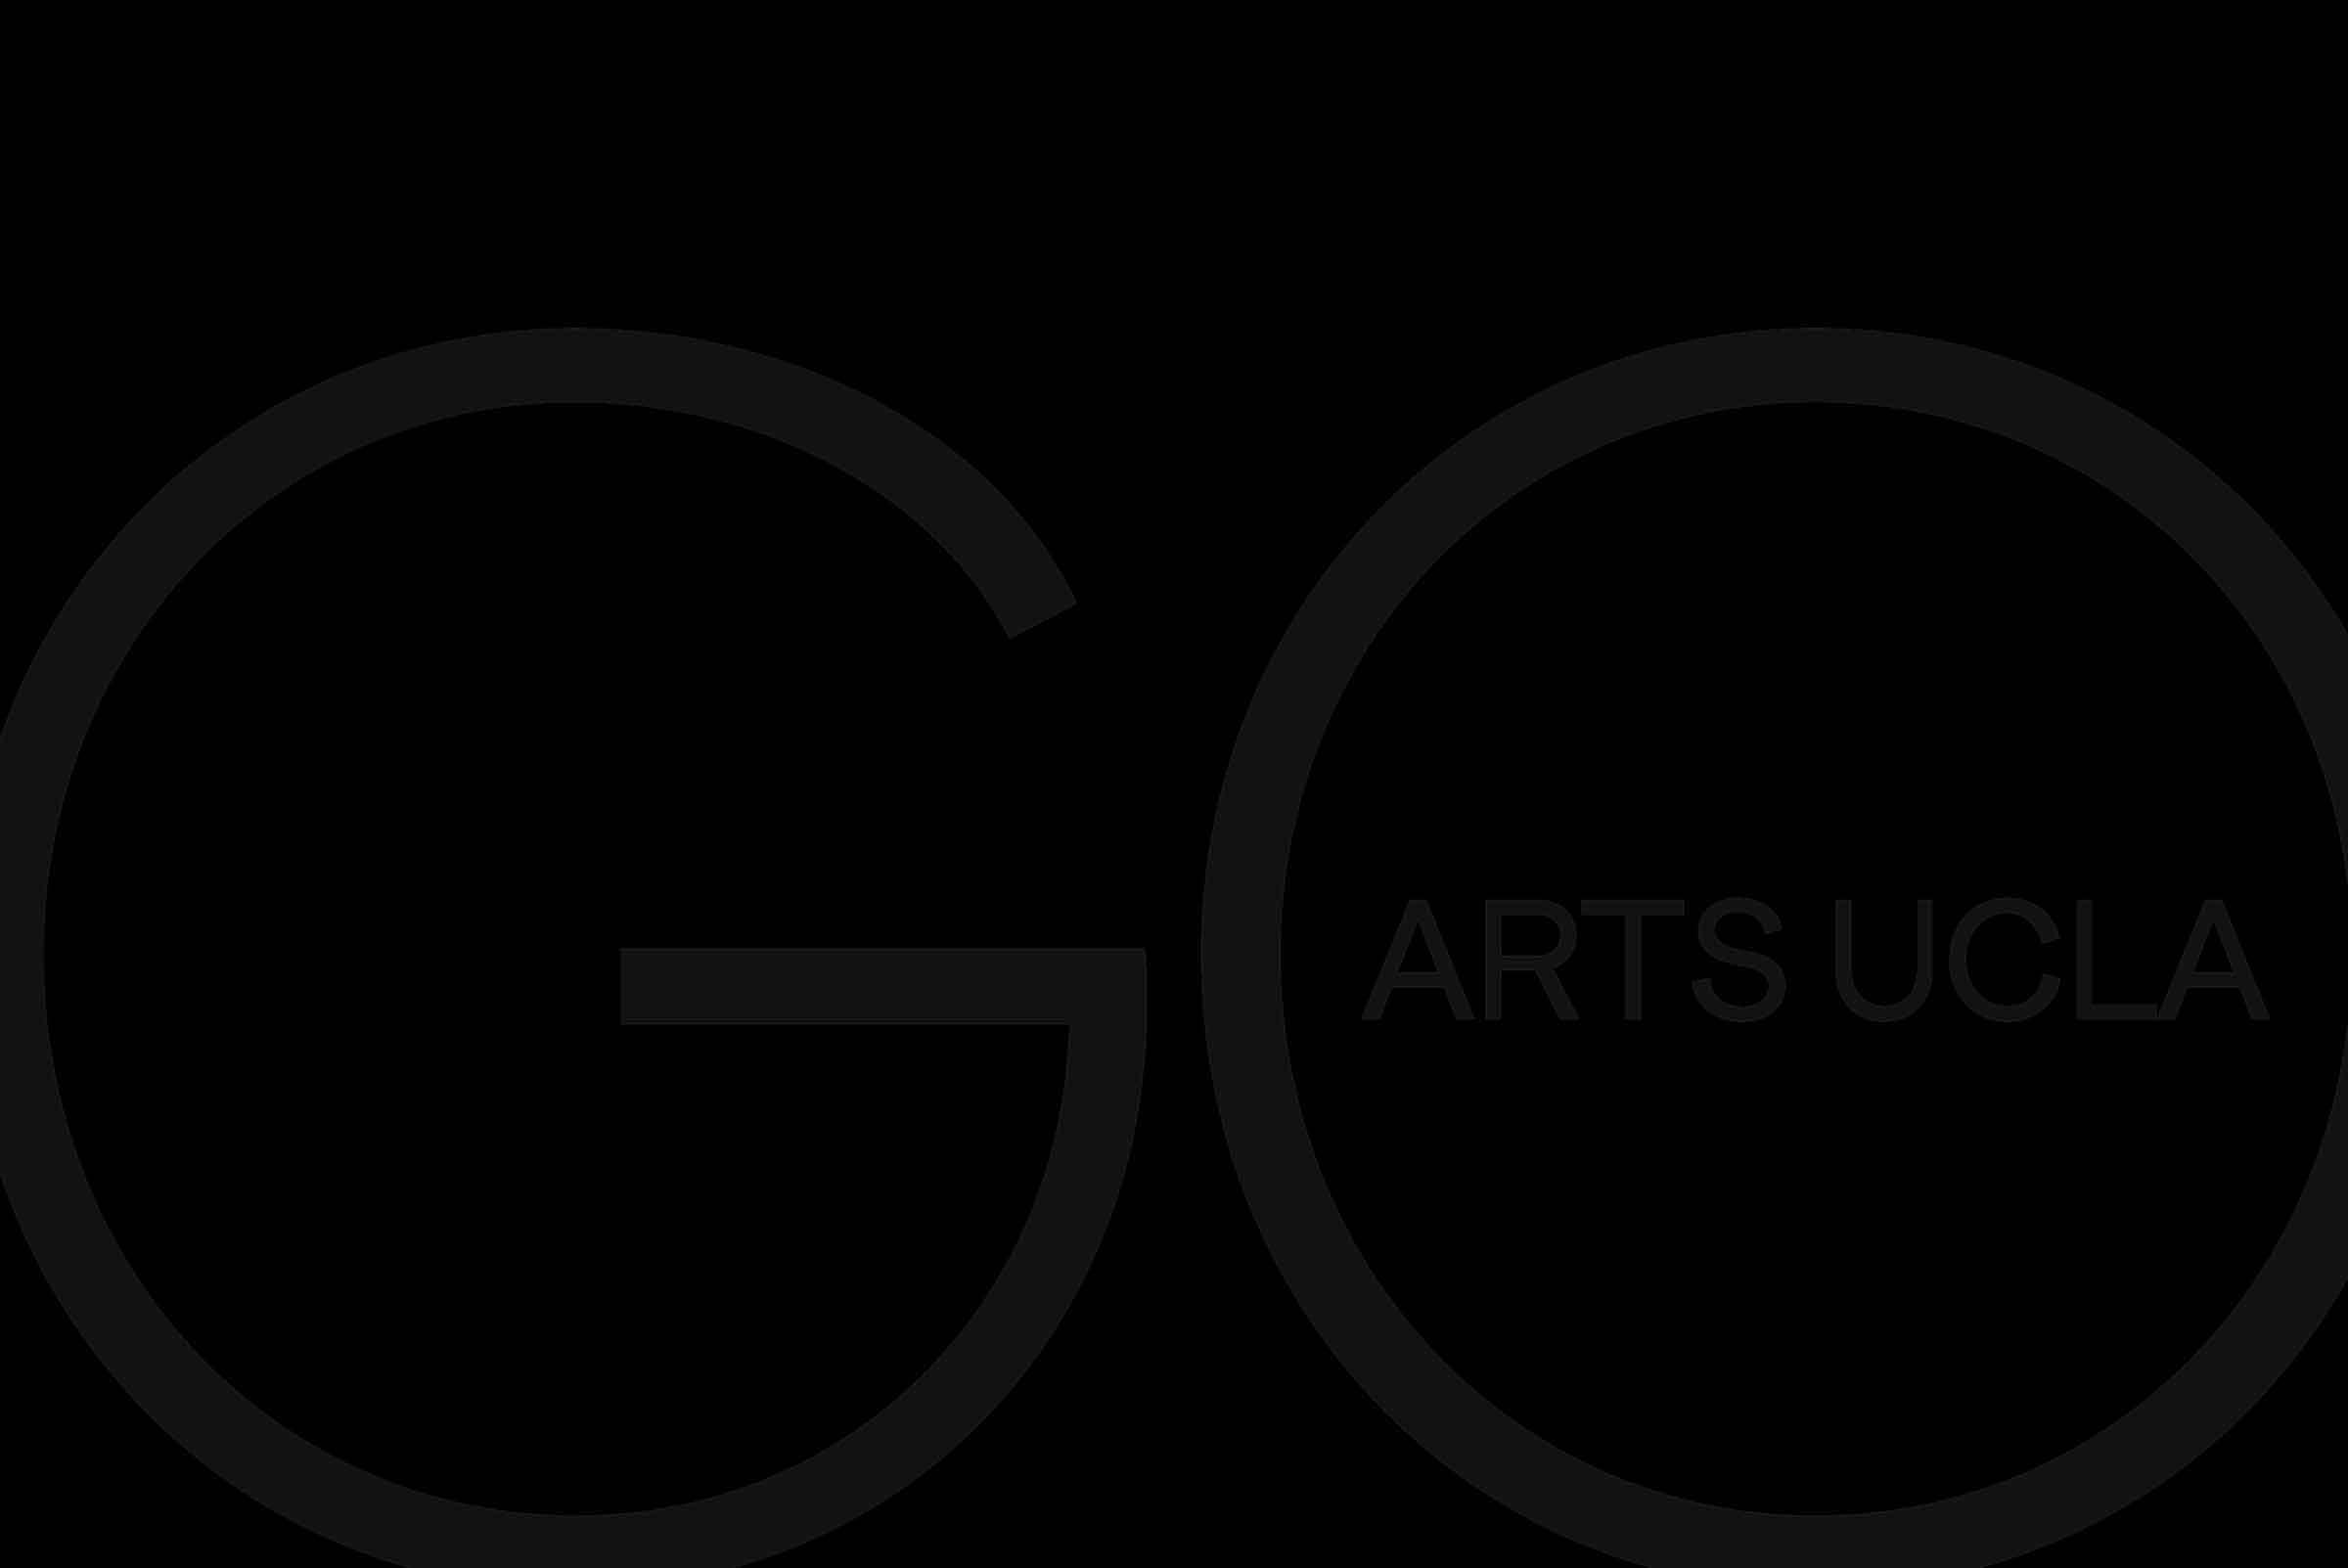 Go Arts Logo